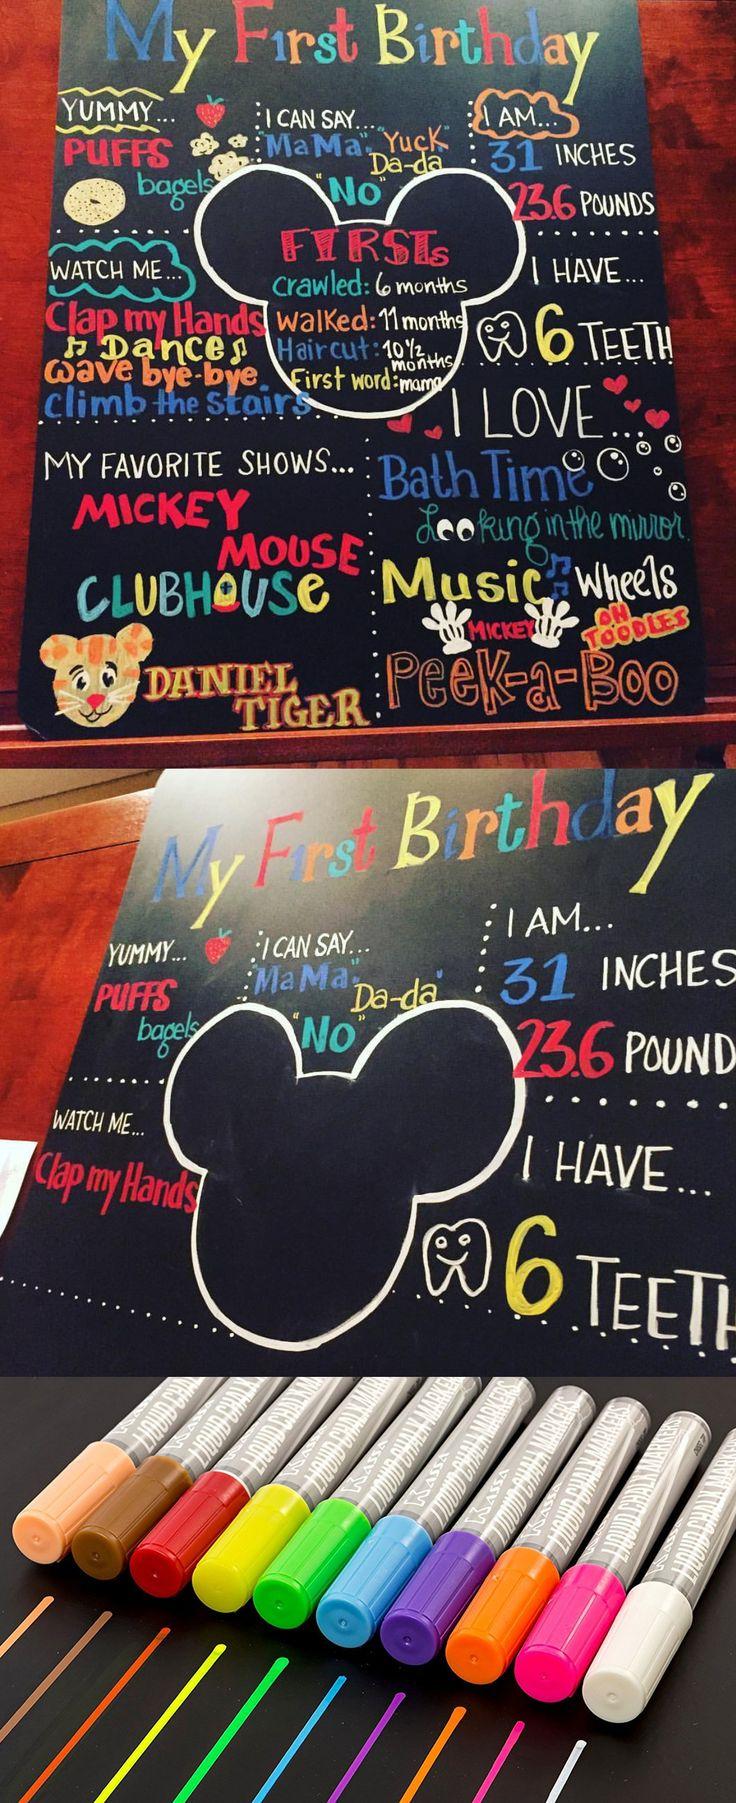 Gmail marker theme - First Birthday Milestone Chalkboard Make With Kassa Liquid Chalk Markers The Center Is A Mickey